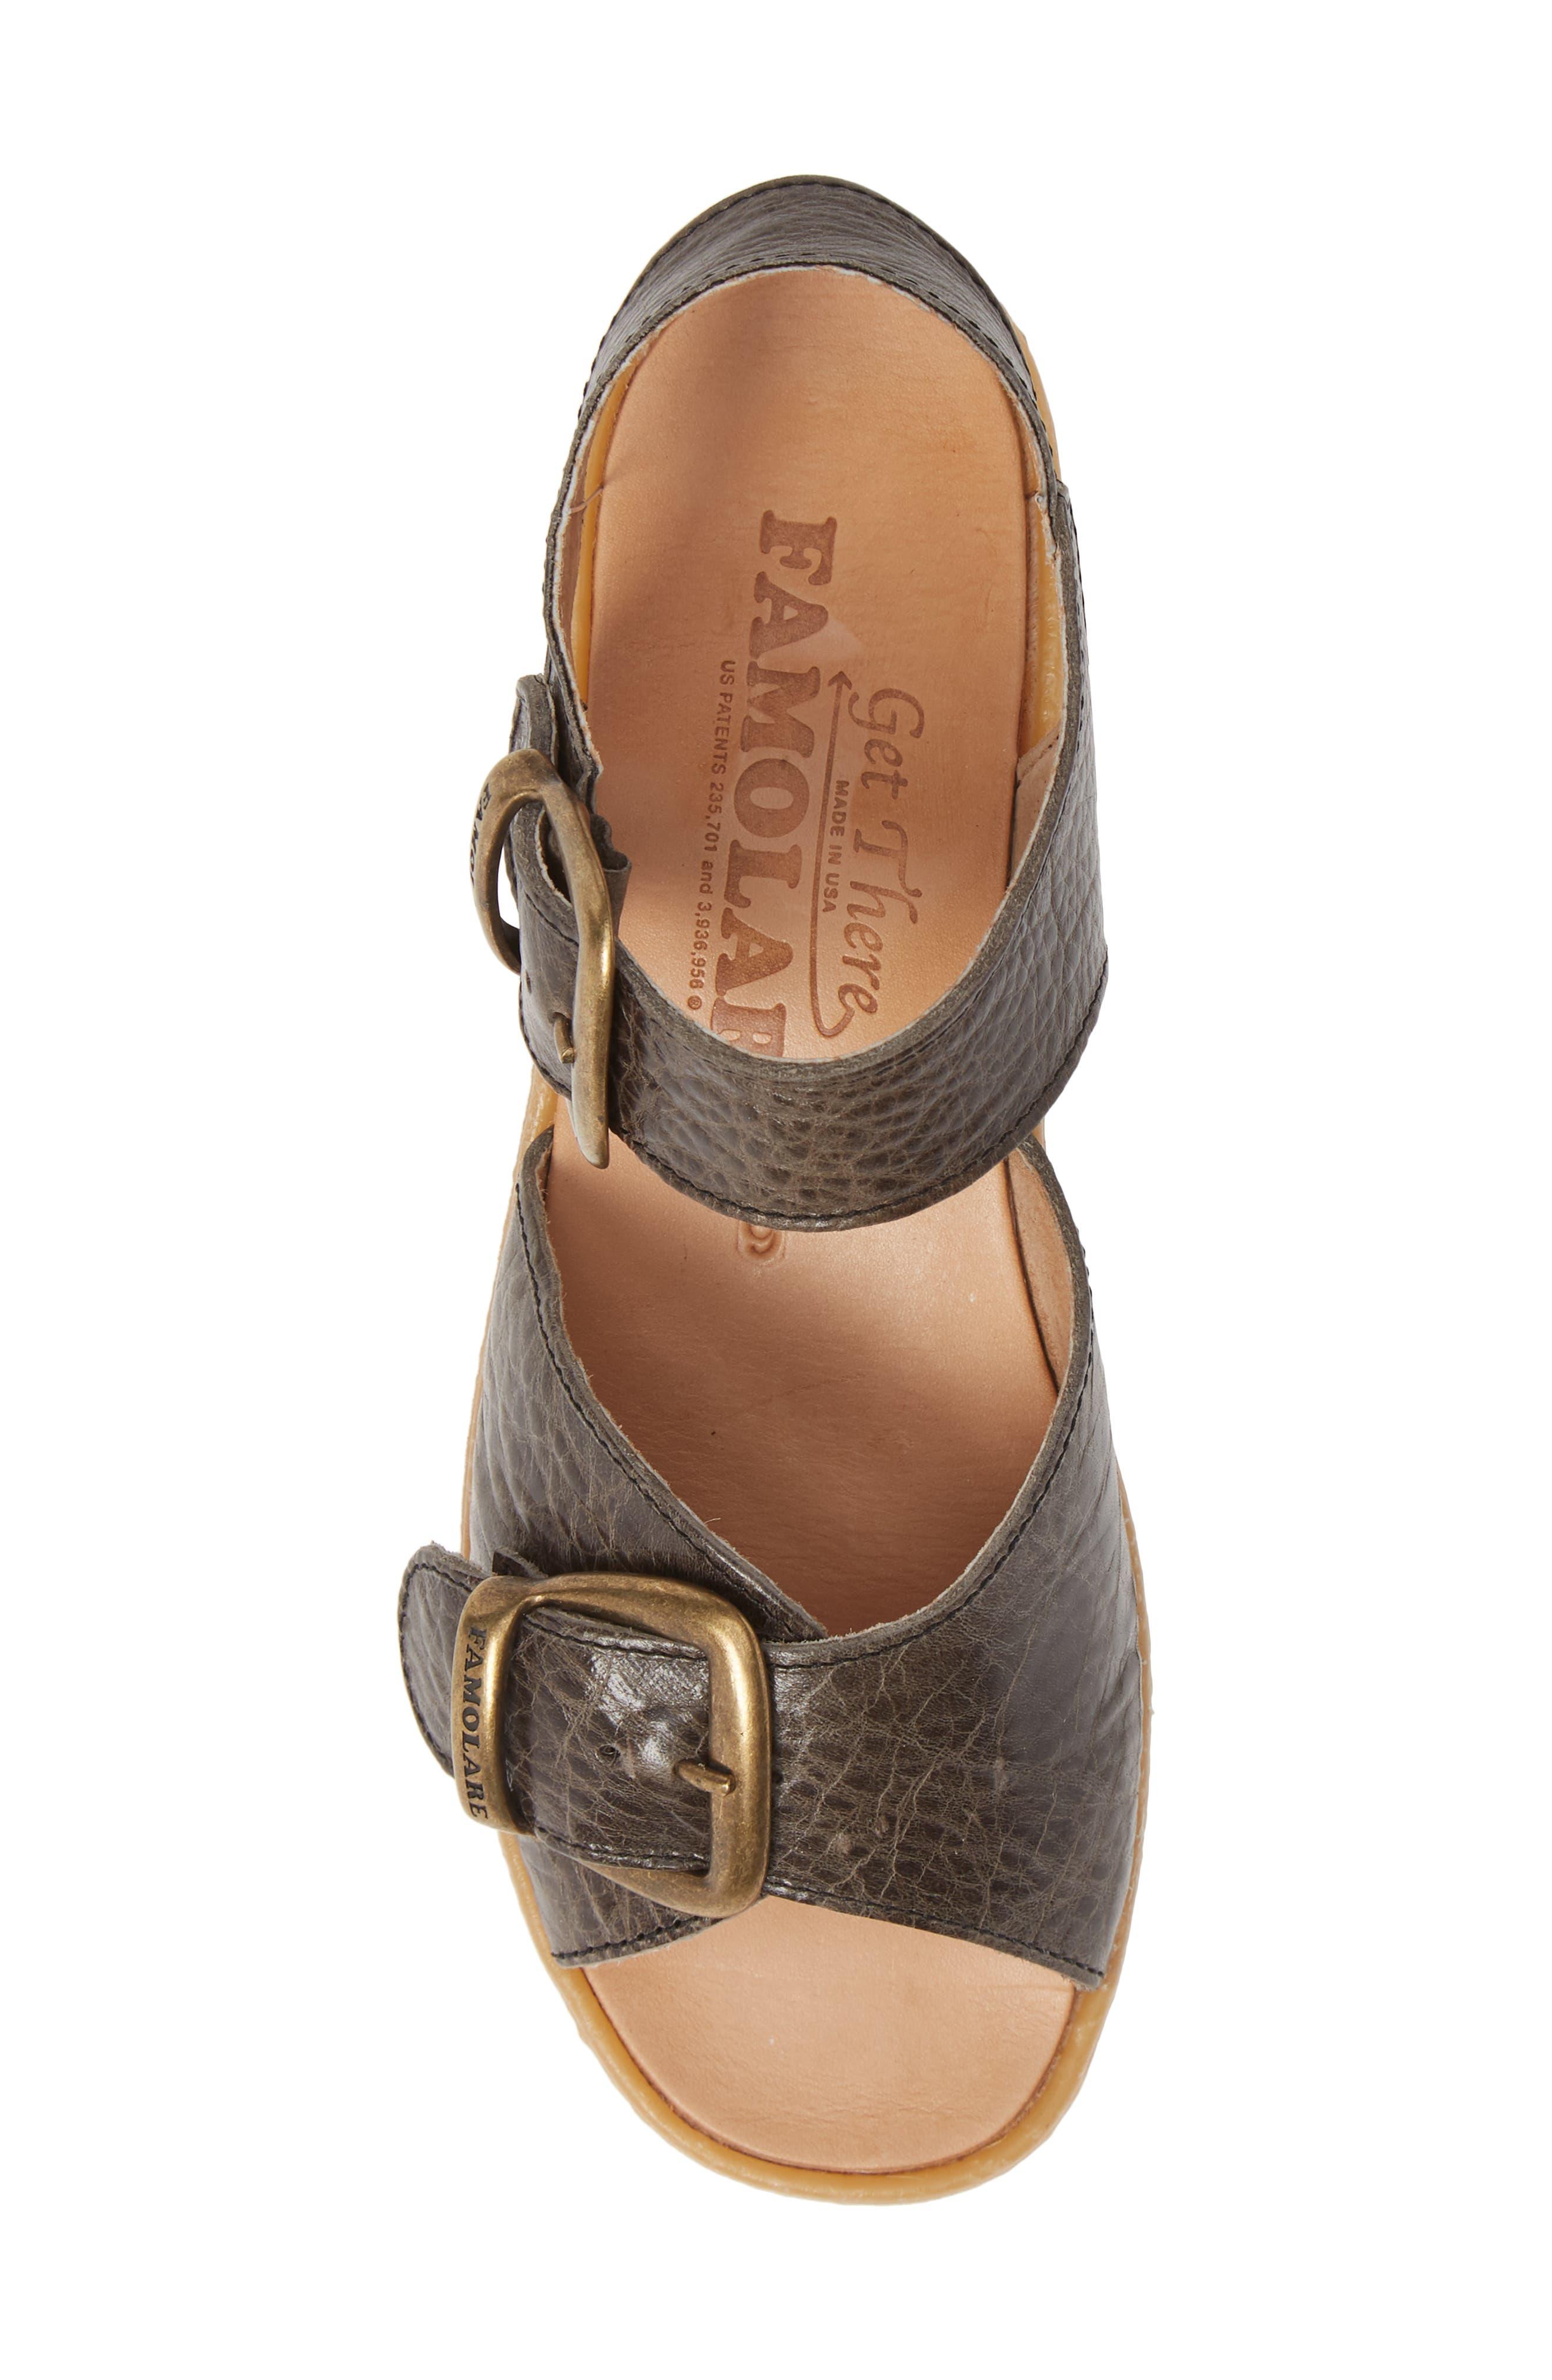 Double Play Platform Sandal,                             Alternate thumbnail 5, color,                             STEEL SUEDE